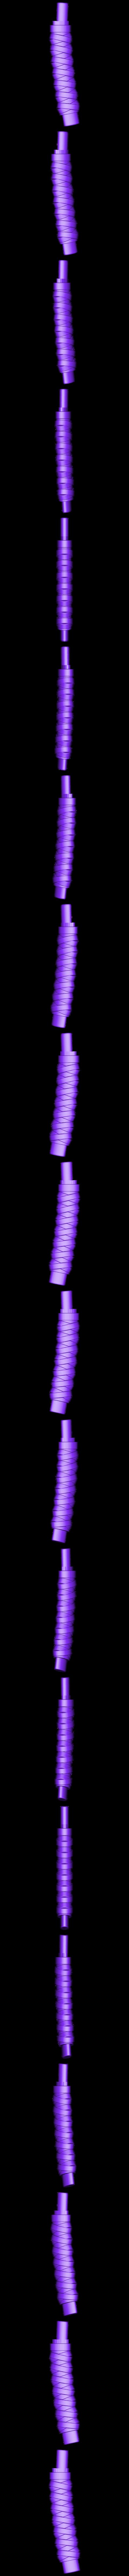 Katana_Handle.stl Download free STL file Training Mini Katana • 3D printer model, mrhers2